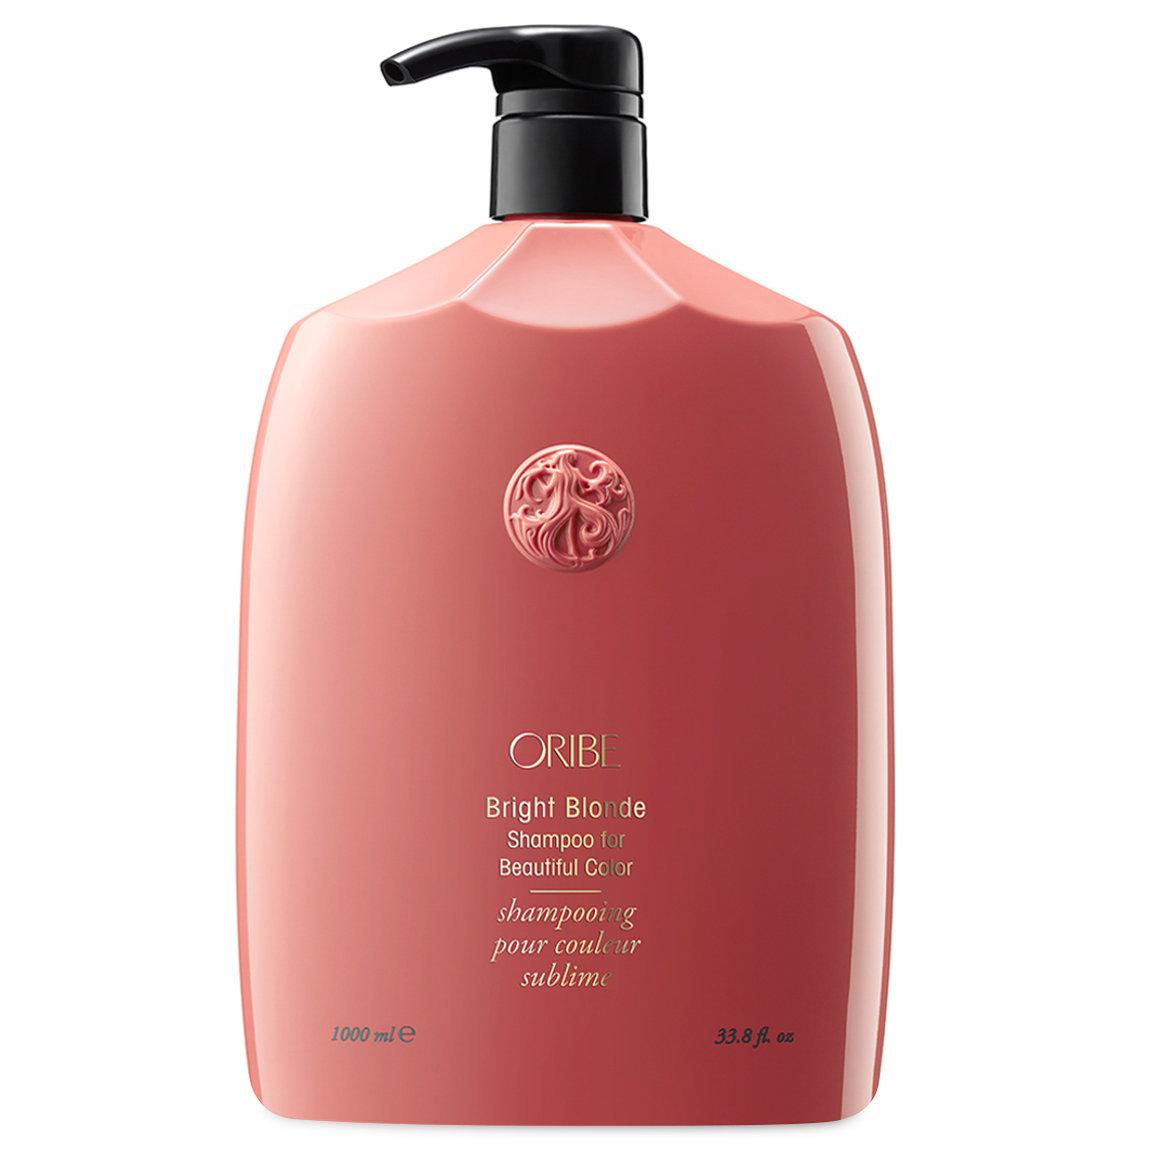 Oribe Bright Blonde Shampoo for Beautiful Color 1 L alternative view 1.